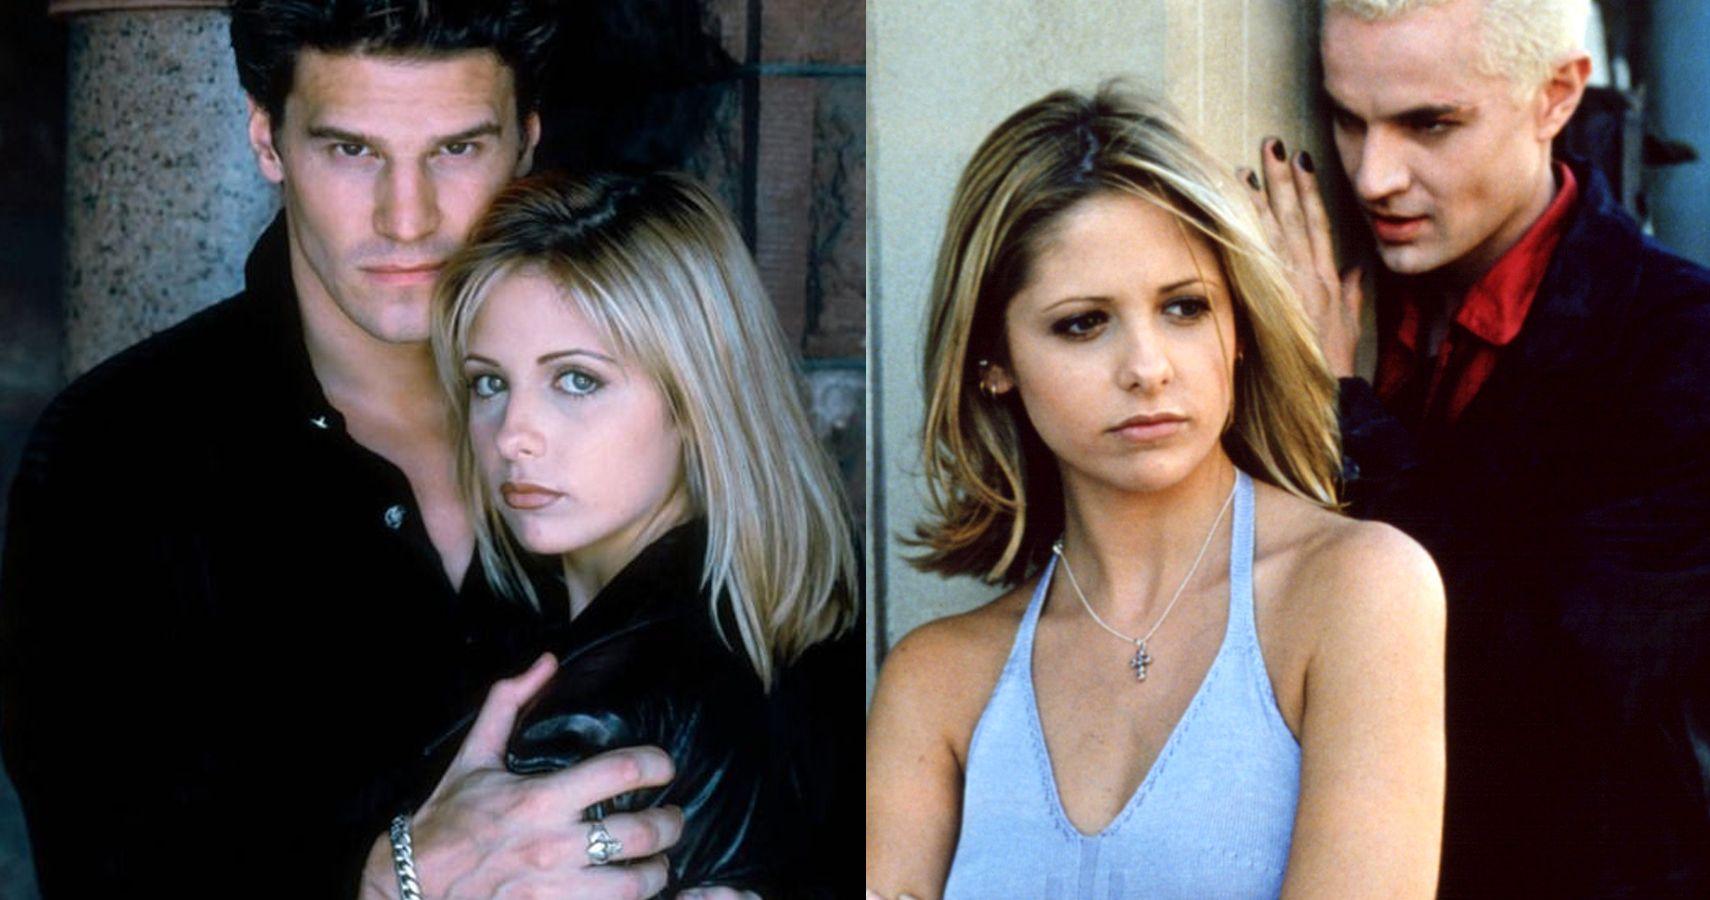 Buffy The Vampire Slayer: 10 Most Tragic Deaths, Ranked